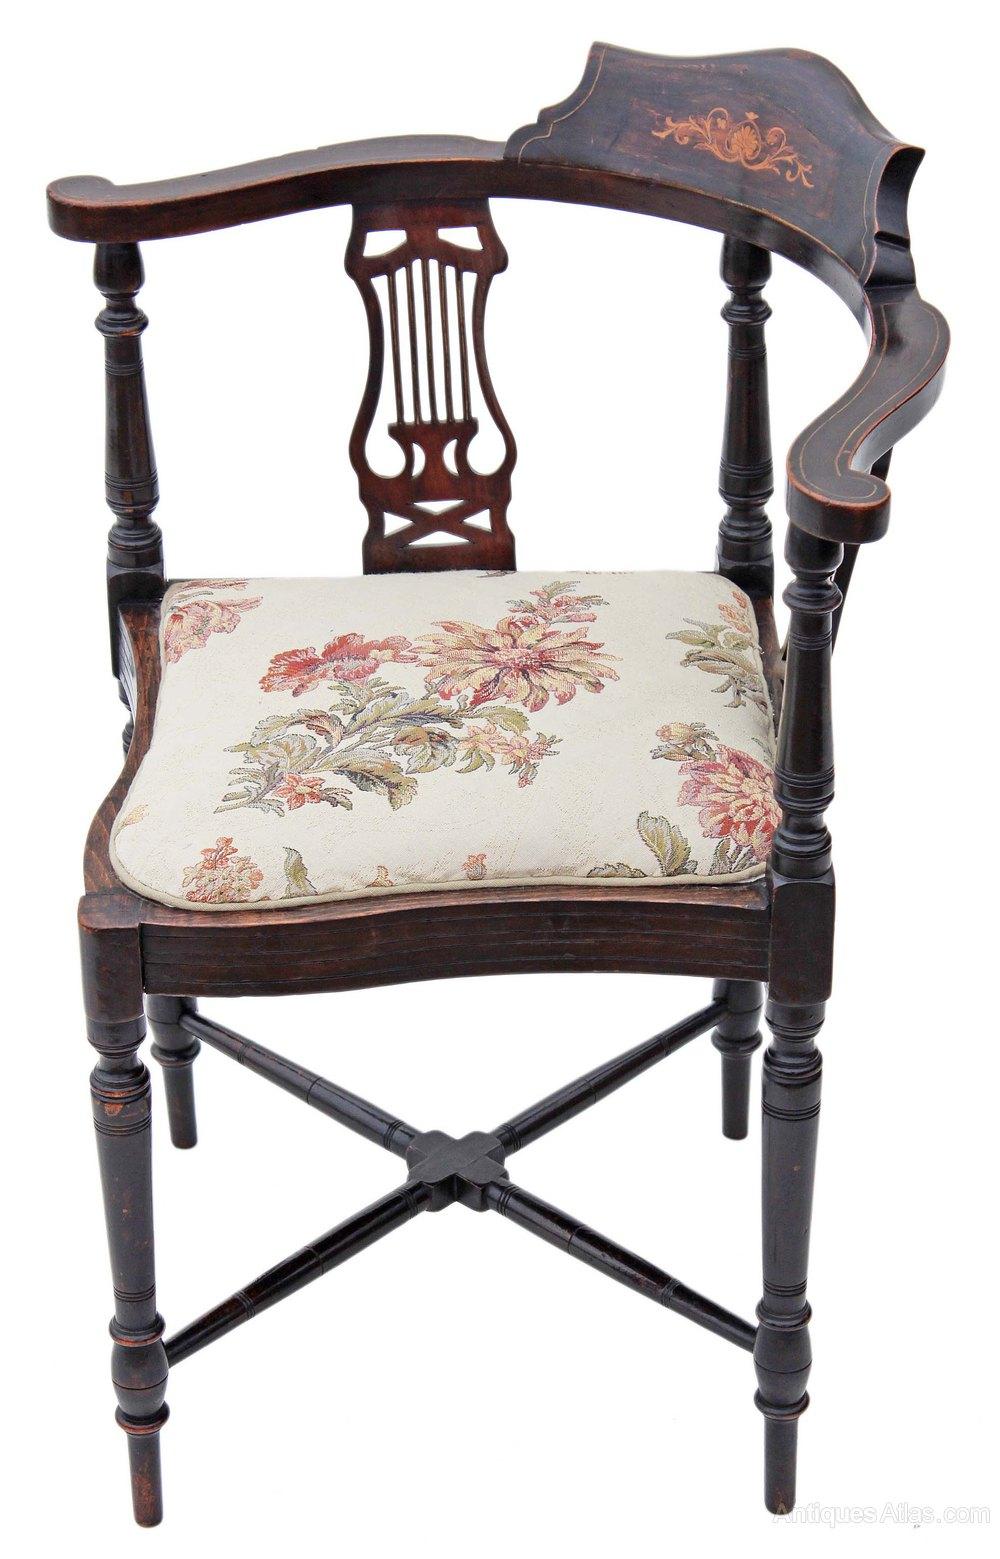 Edwardian Inlaid Mahogany Corner Chair Bedroom Antiques